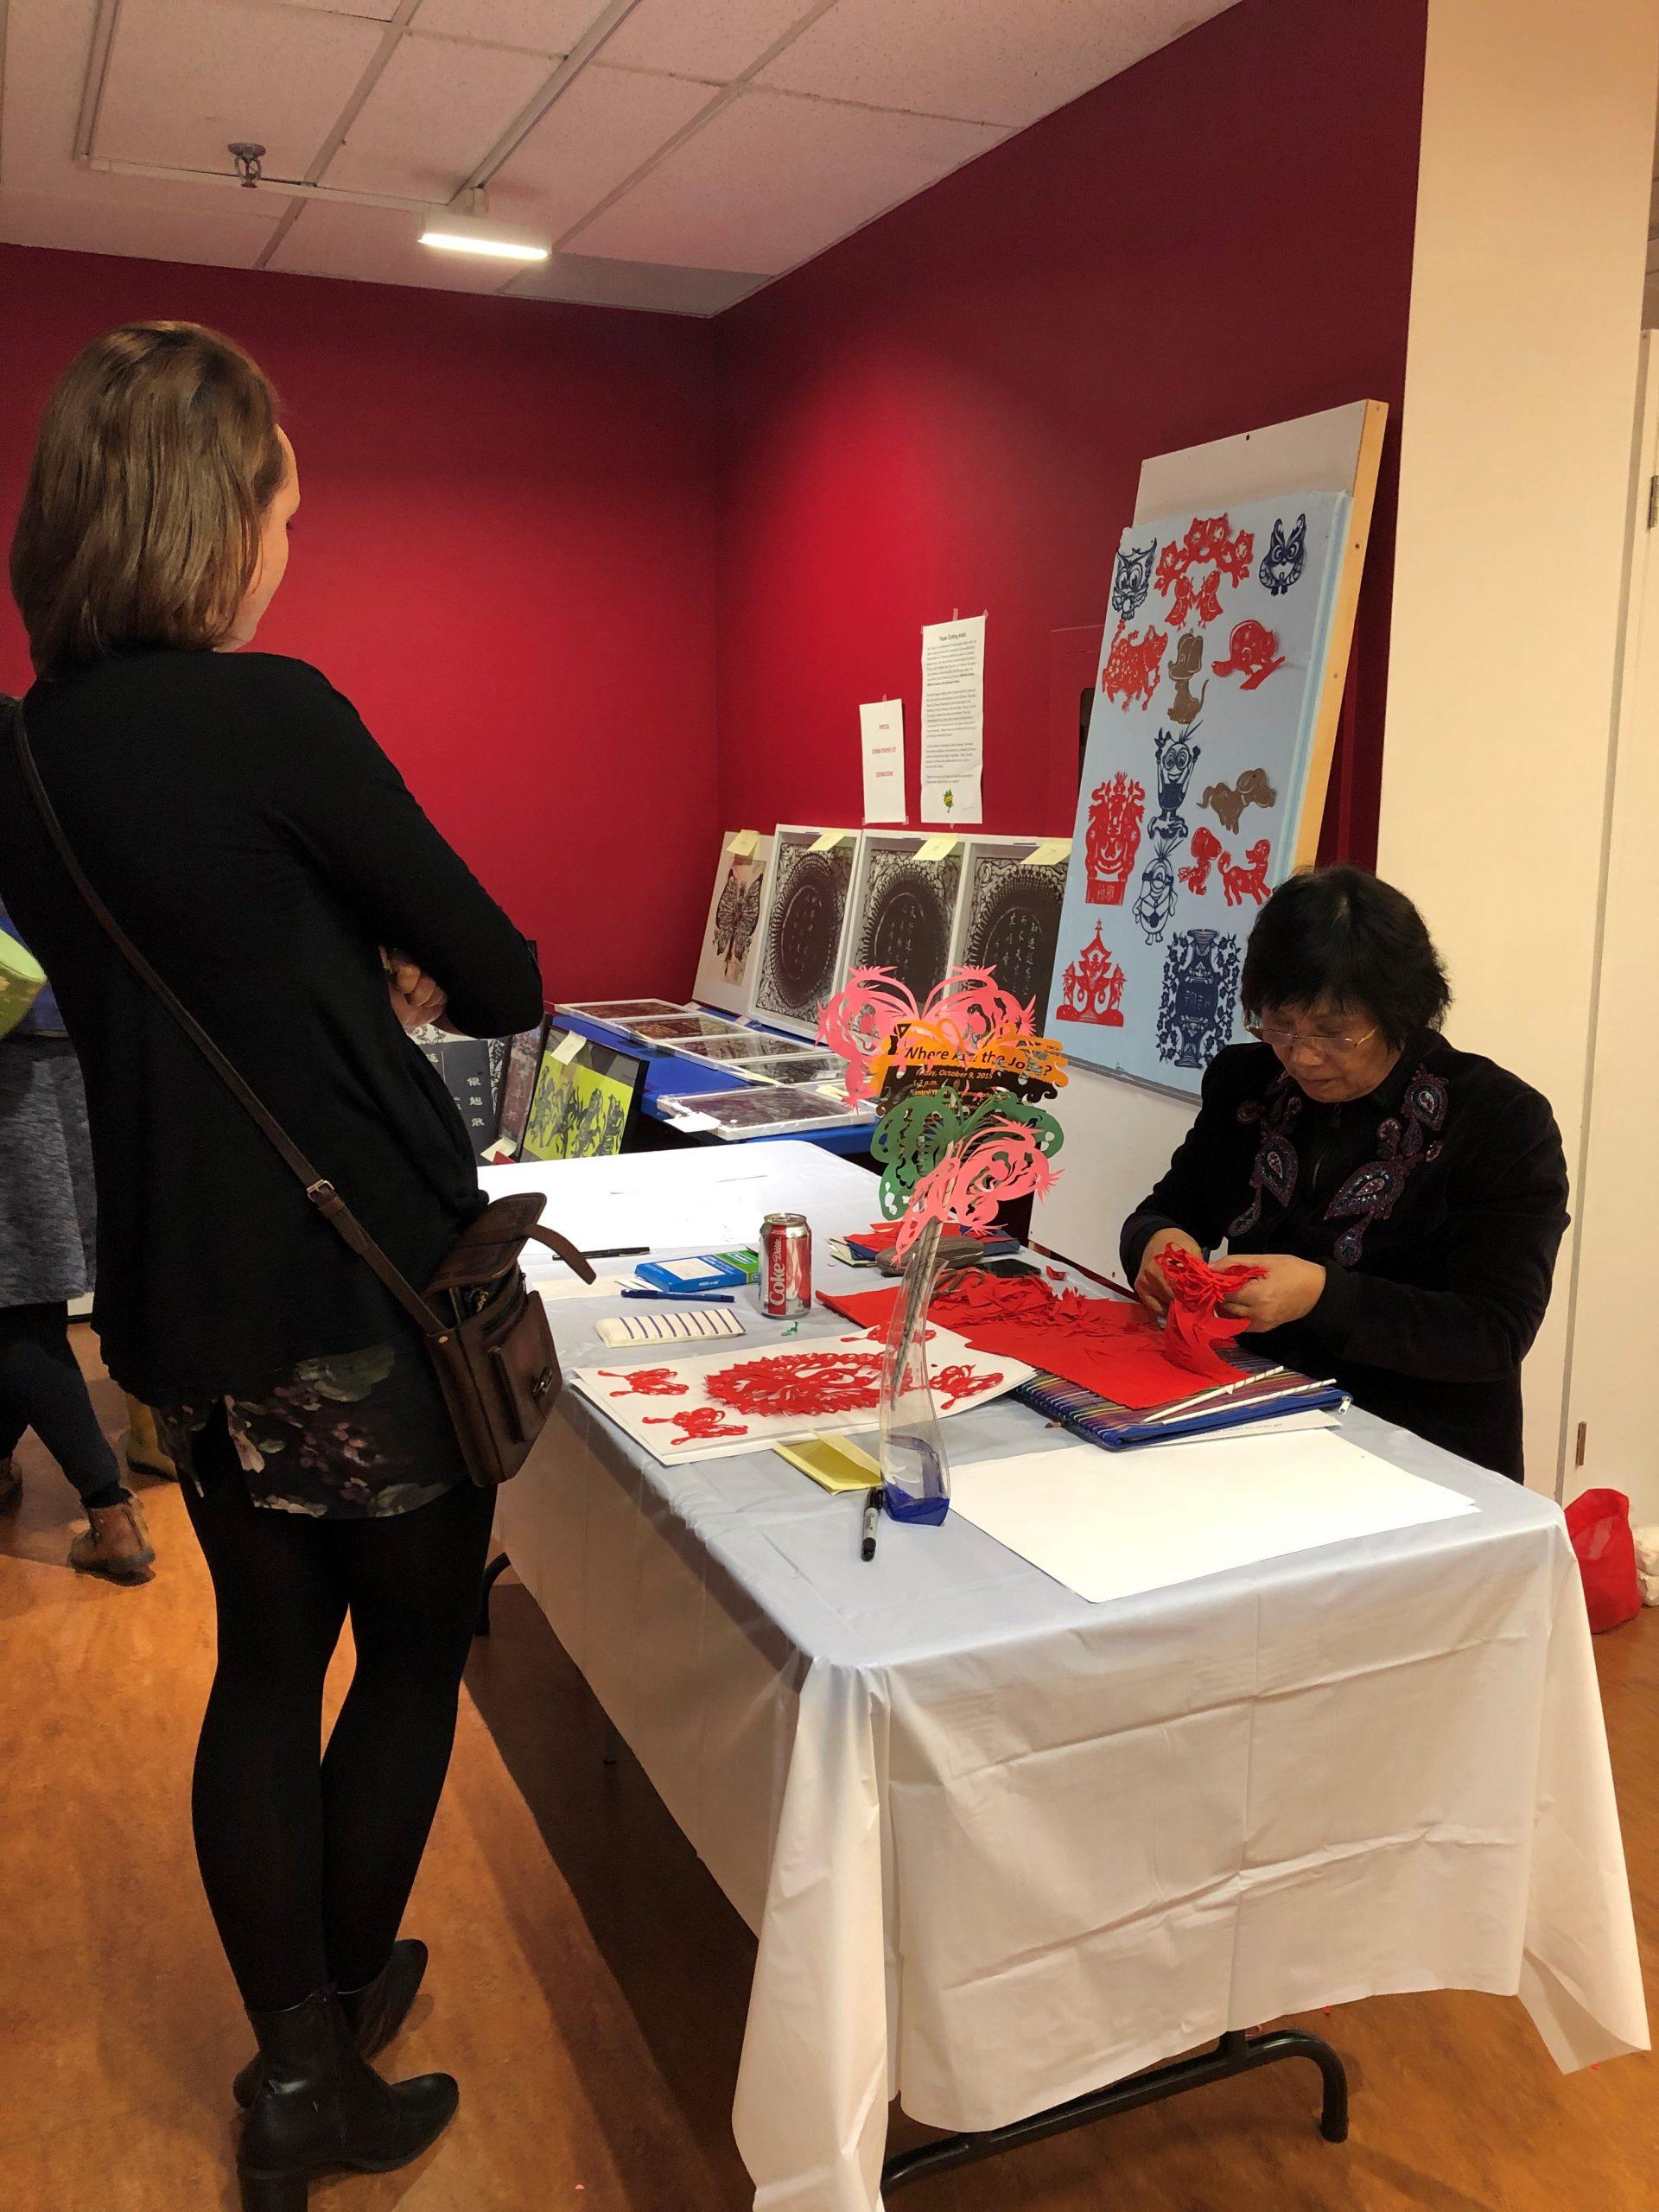 Paper Cutting artist Xiqin Li, creating a custom piece for volunteer Erinn